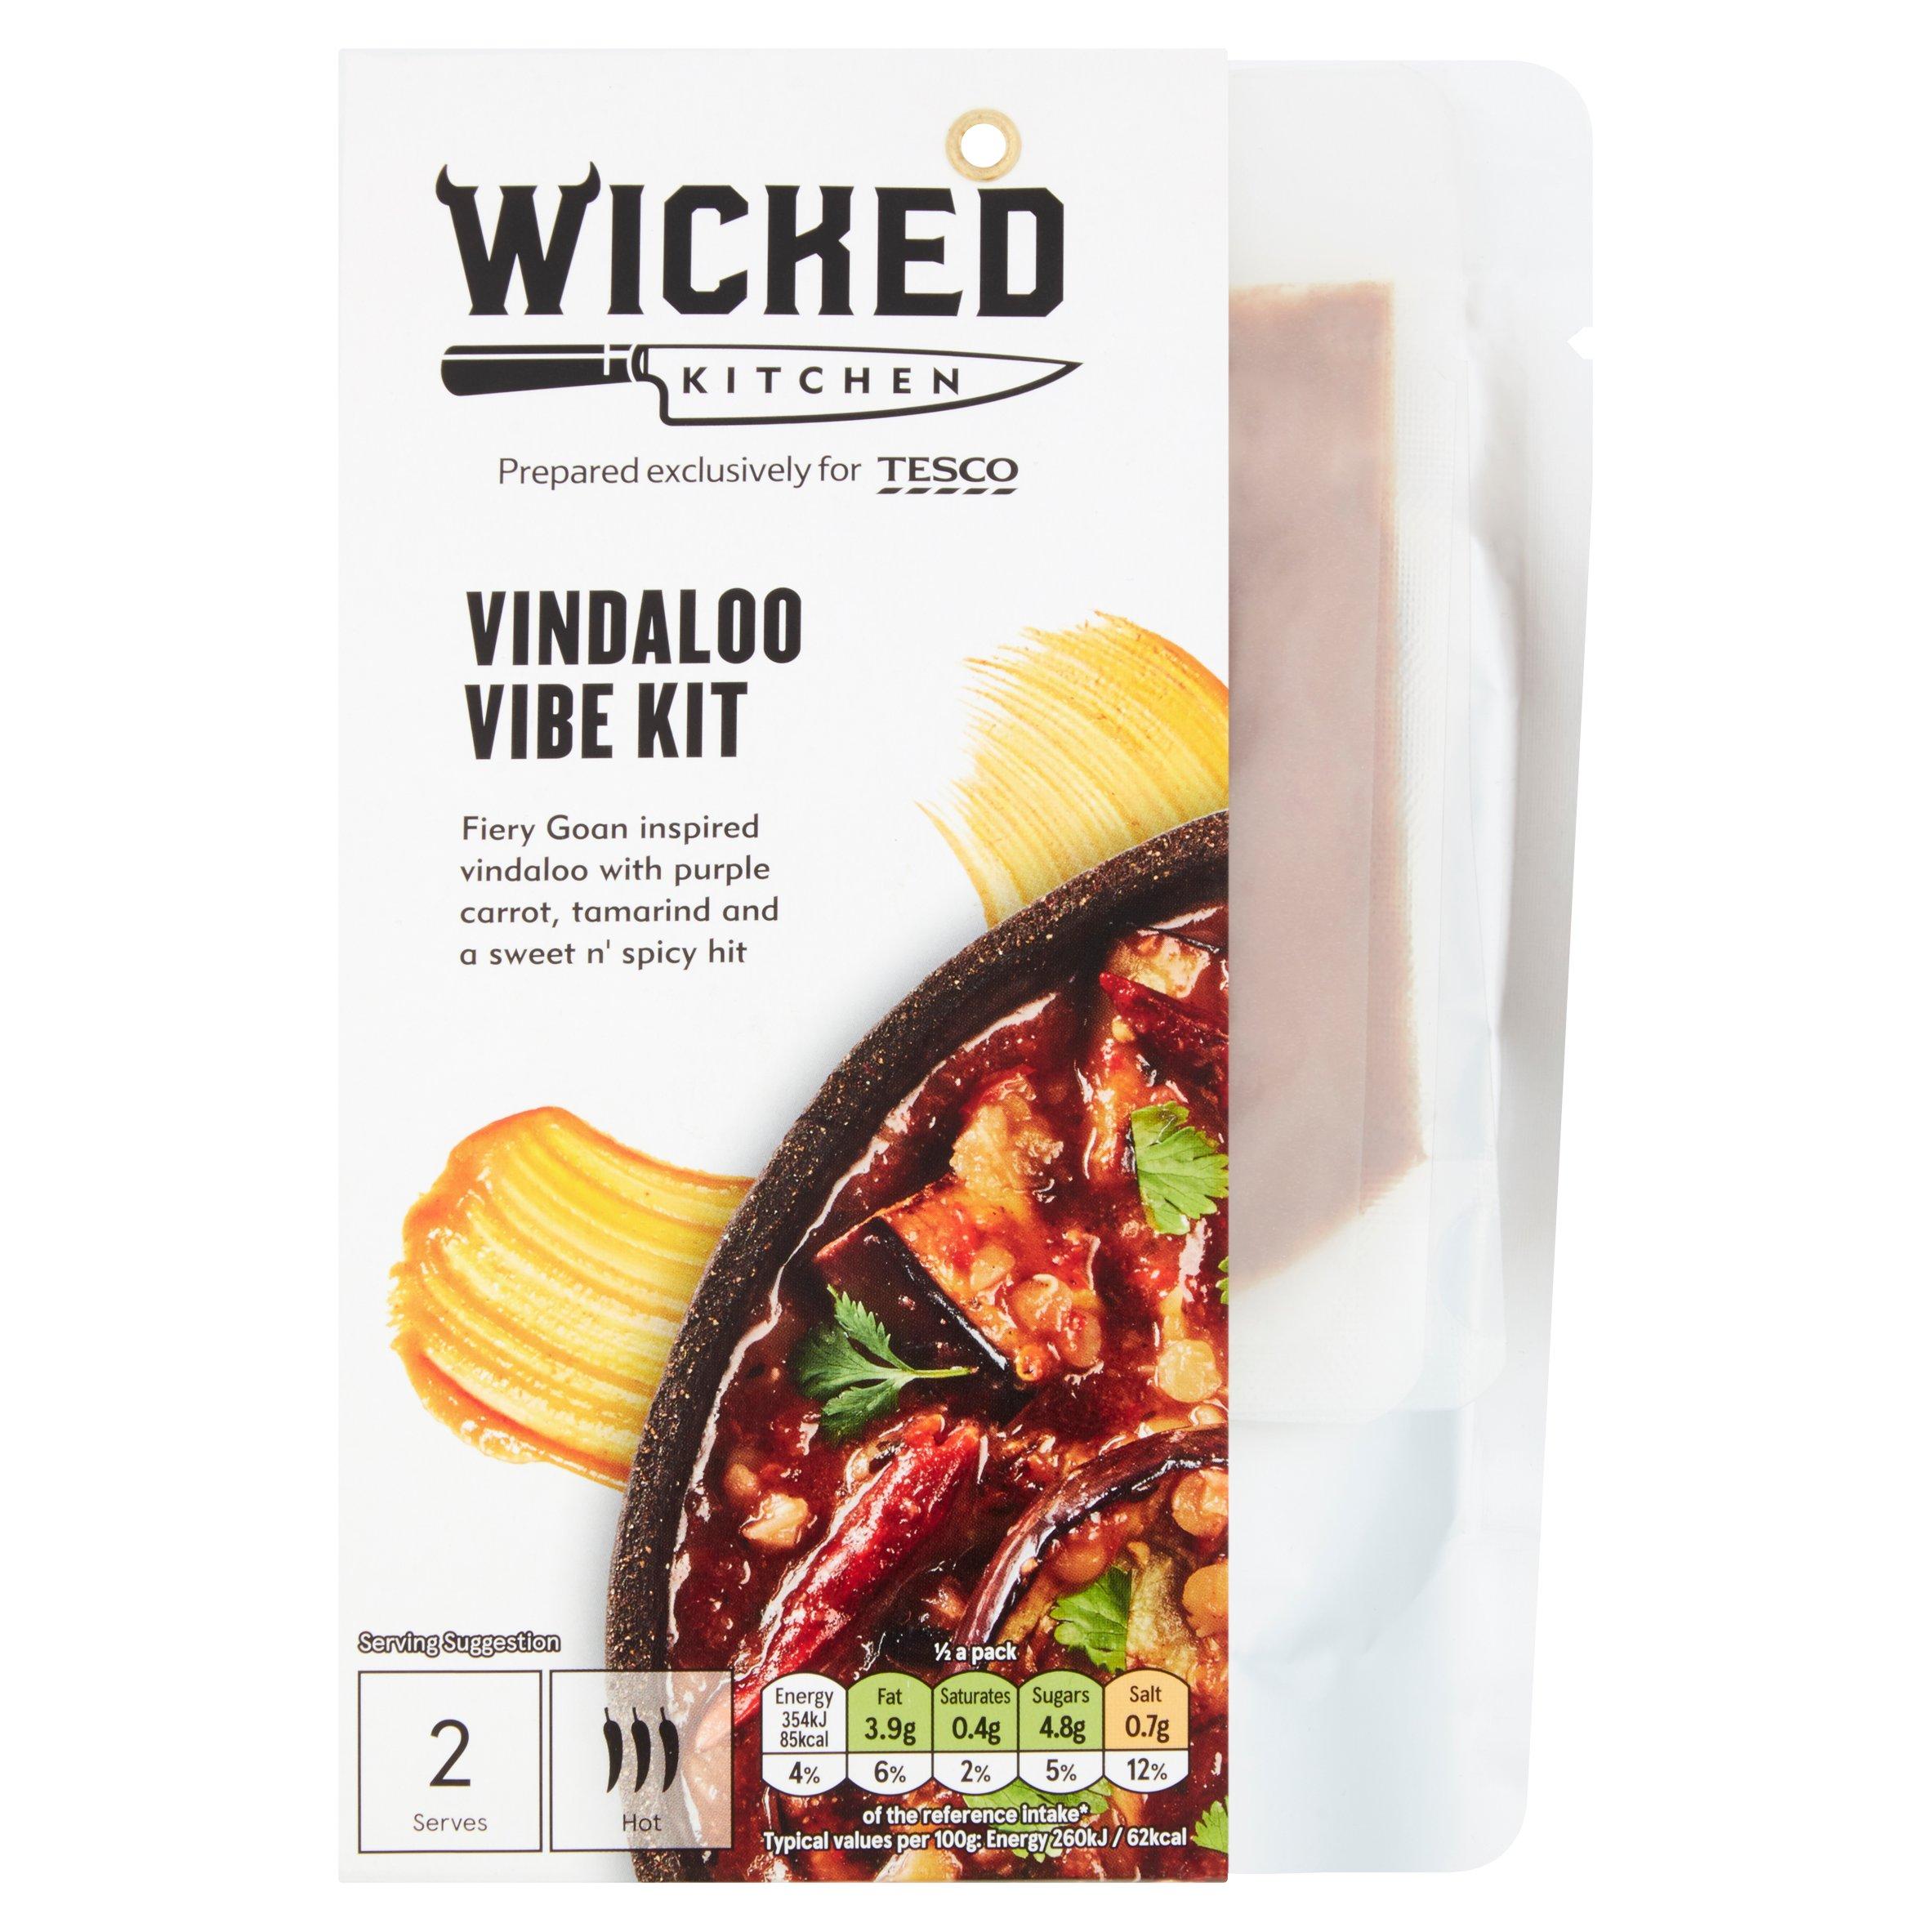 Wicked Kitchen Vindaloo Vibe Kit 272G